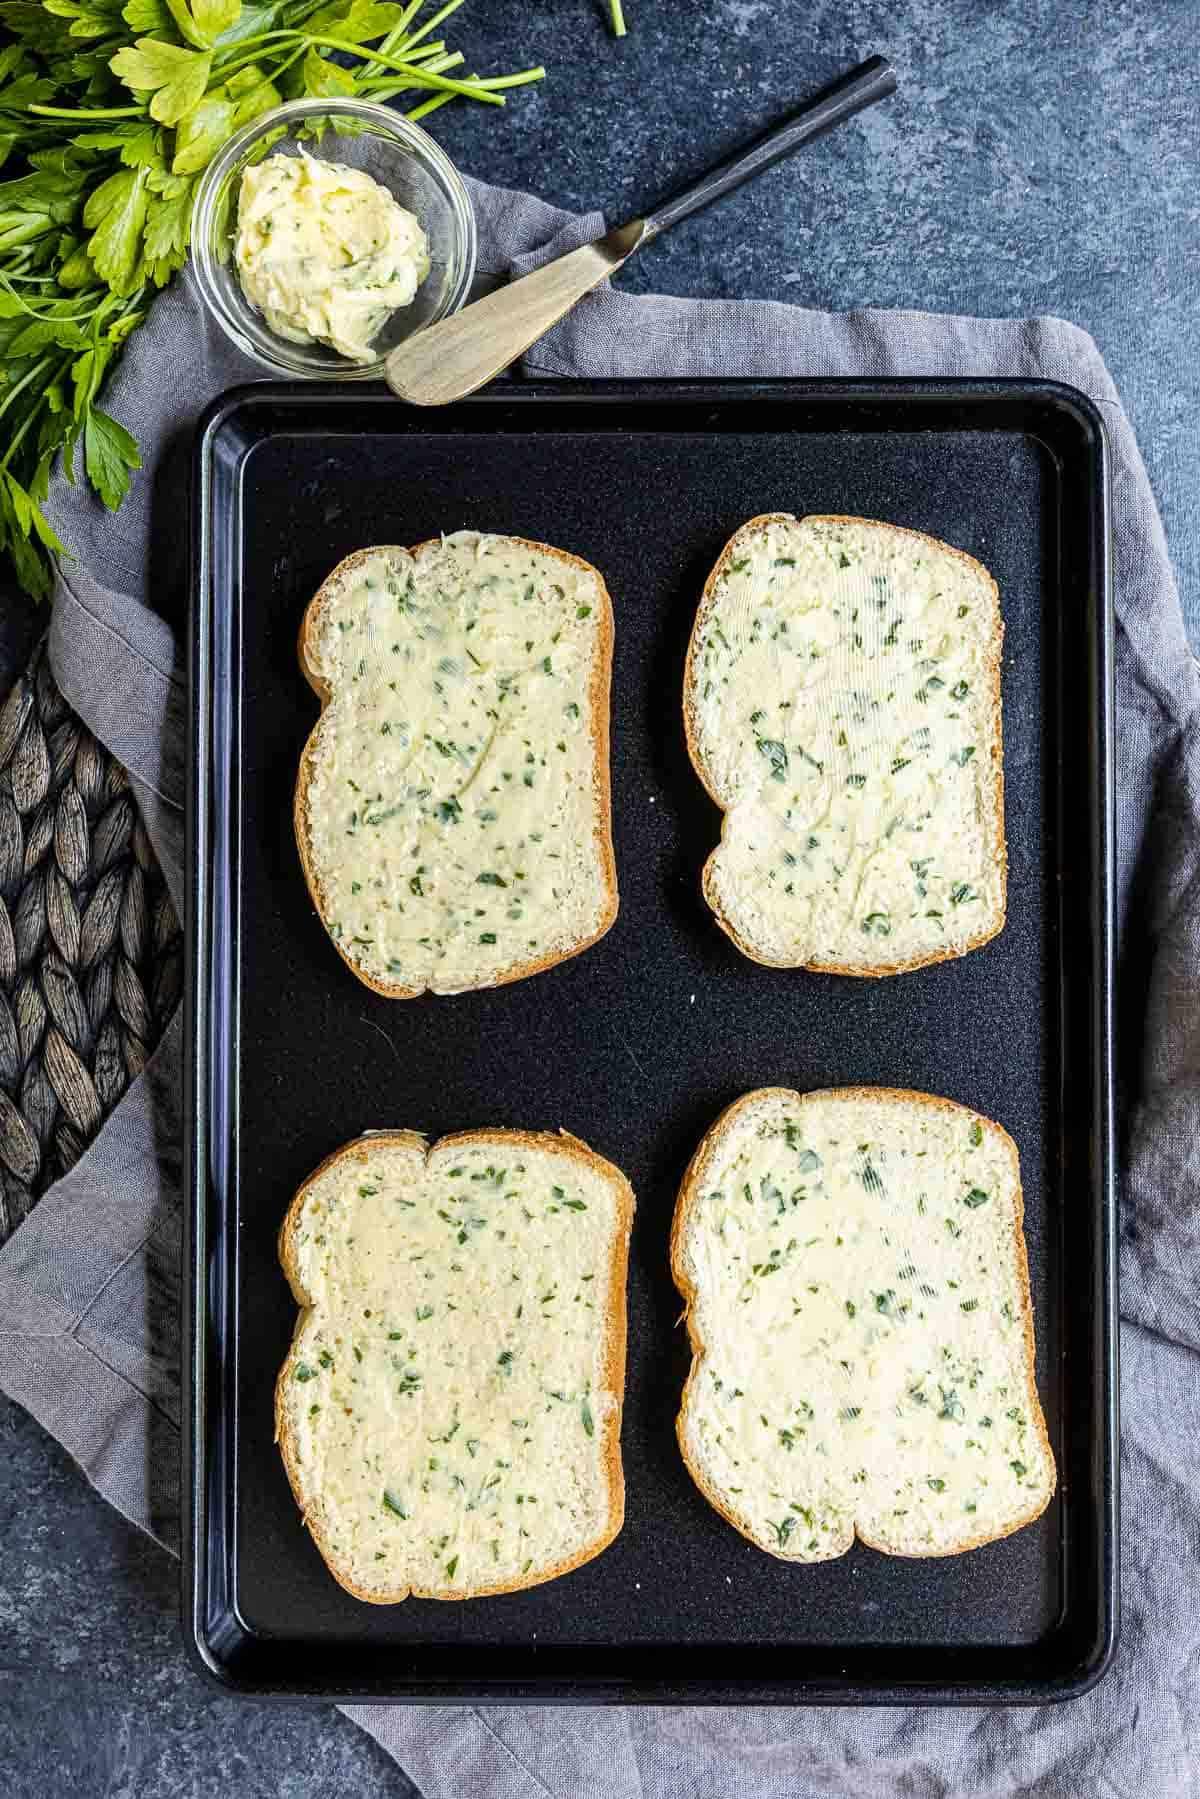 buttered Texas Toast on sheet pan